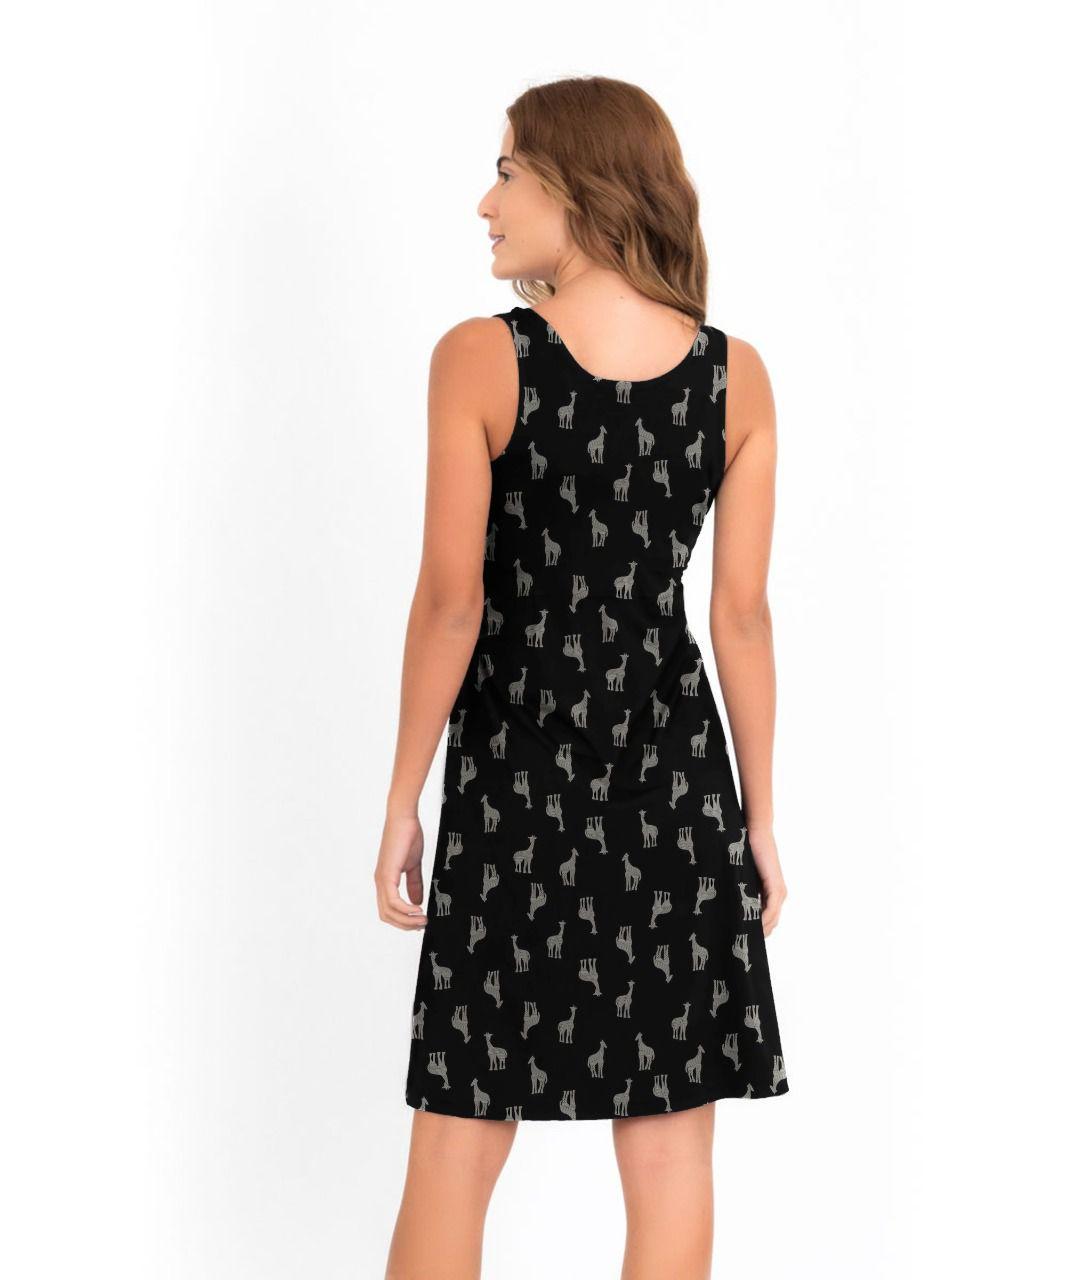 Vestido Mônica - Girafa   - Lalie Lalou